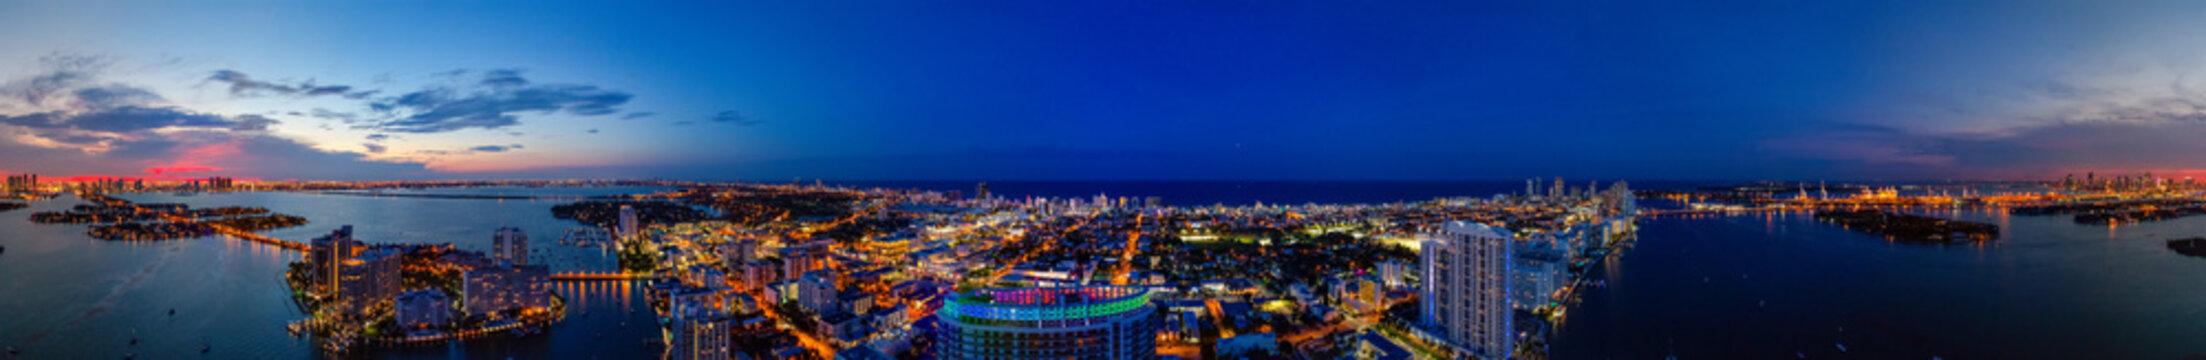 Aerial panorama Miami Beach twilight with neon city lights